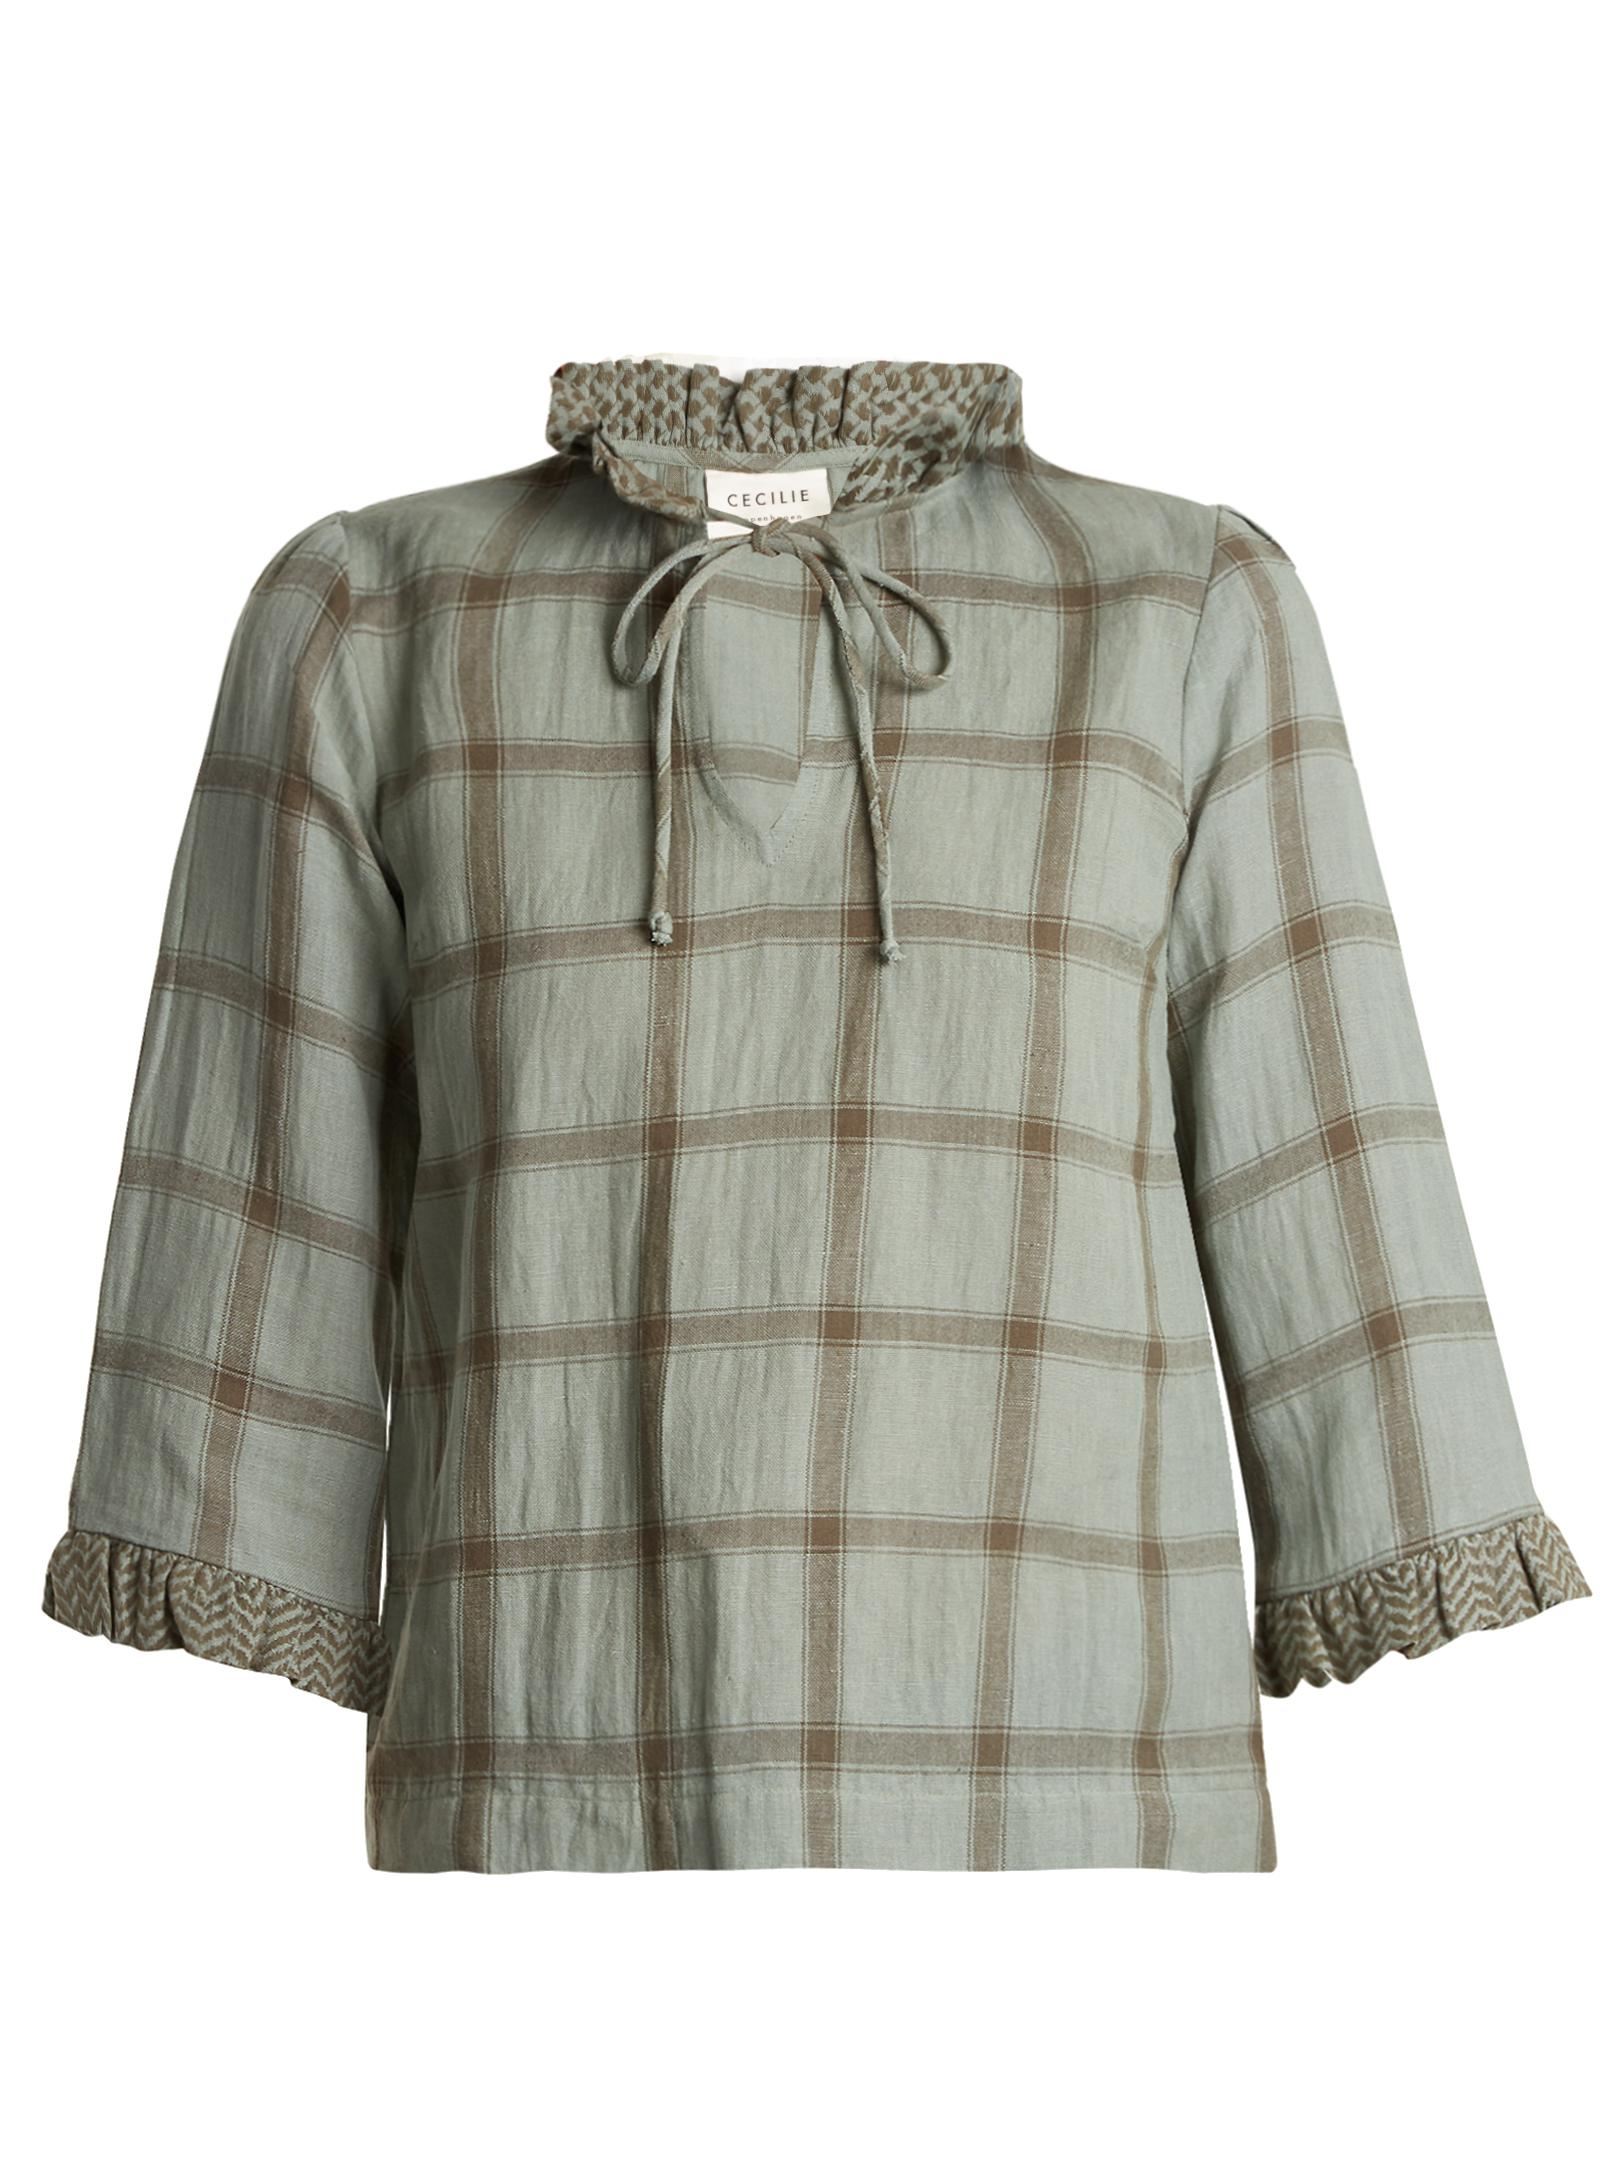 Nicekicks Sale Online Shopping Online Outlet Sale Tie-neck cotton and linen-blend checked top Cecilie Copenhagen Order Online Discount Pick A Best hCej2Ta